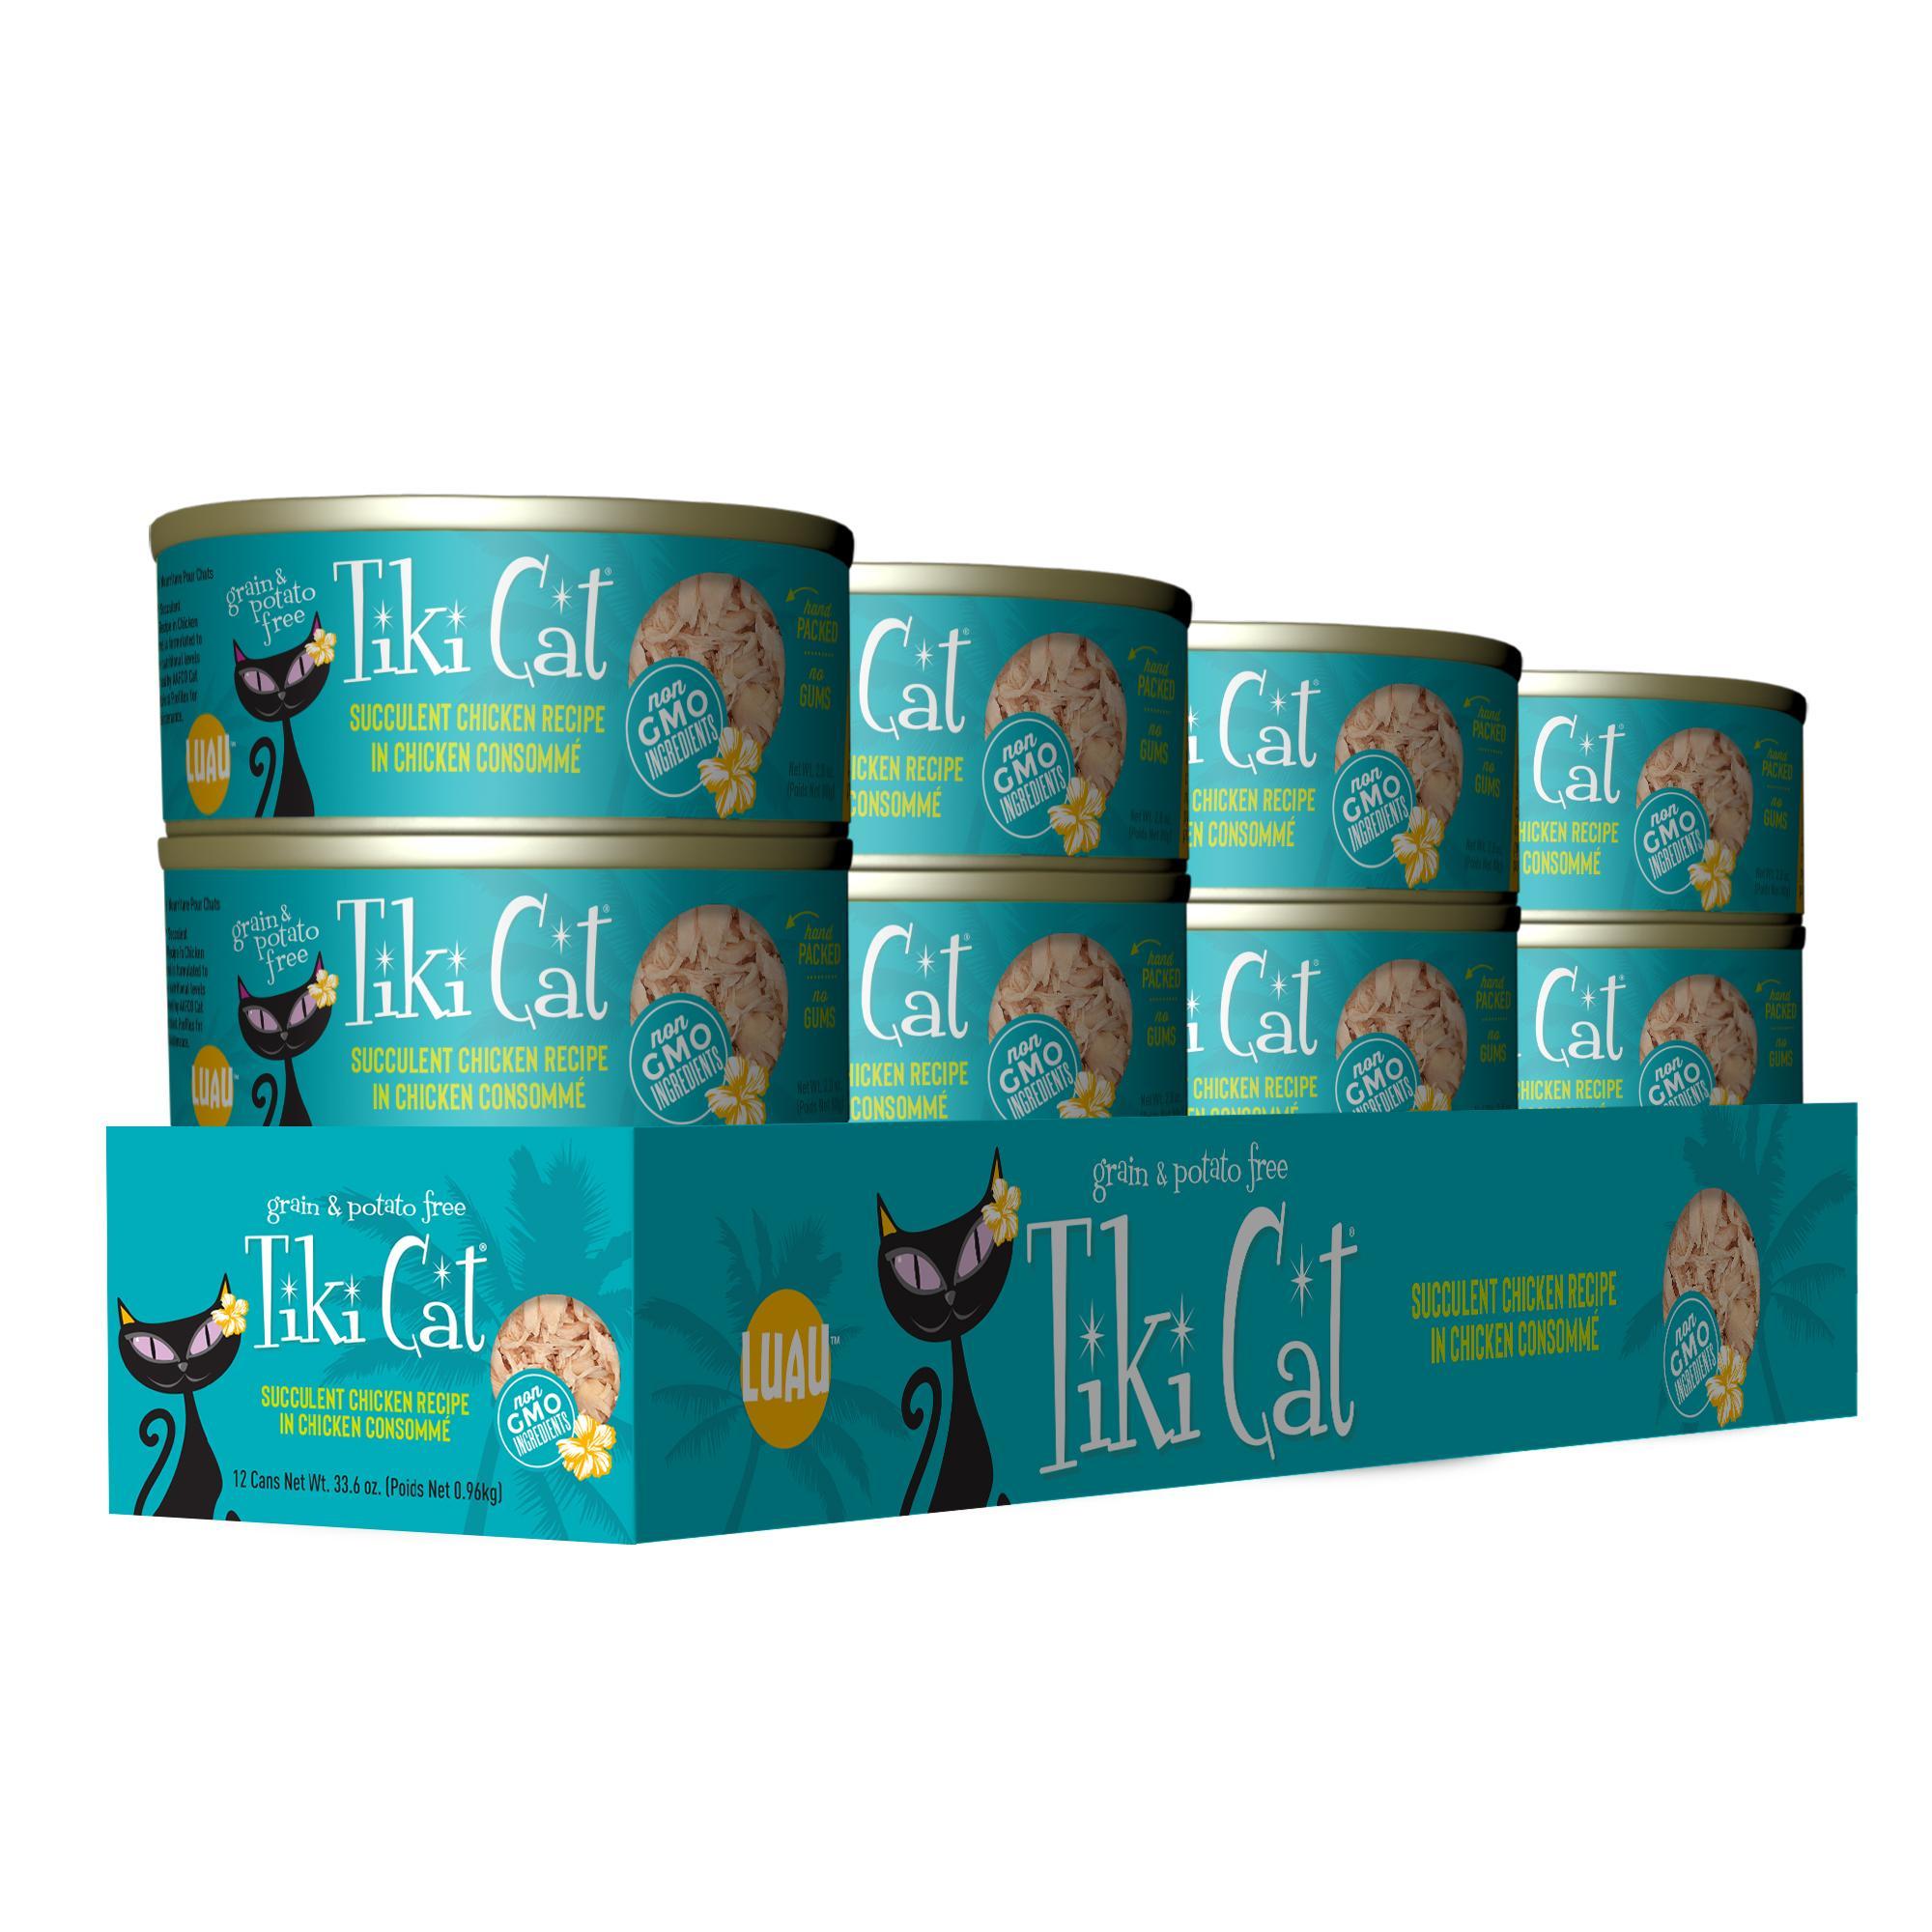 Tiki Cat Luau Succulent Chicken Recipe in Consomme, 2.8-oz, case of 12